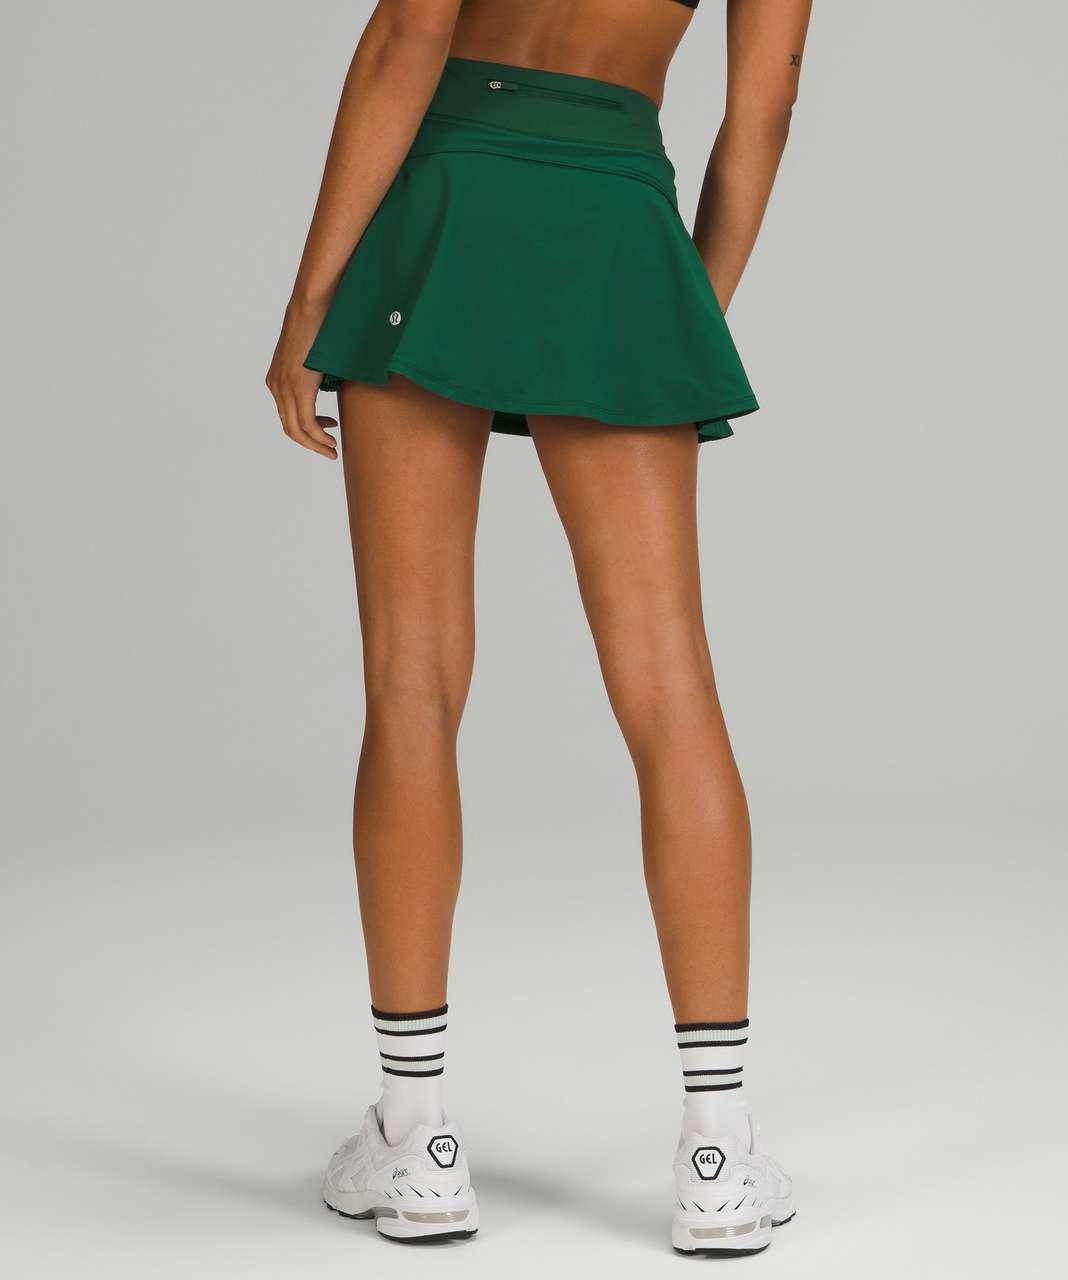 Lululemon Play Off the Pleats Mid-Rise Skirt - Everglade Green